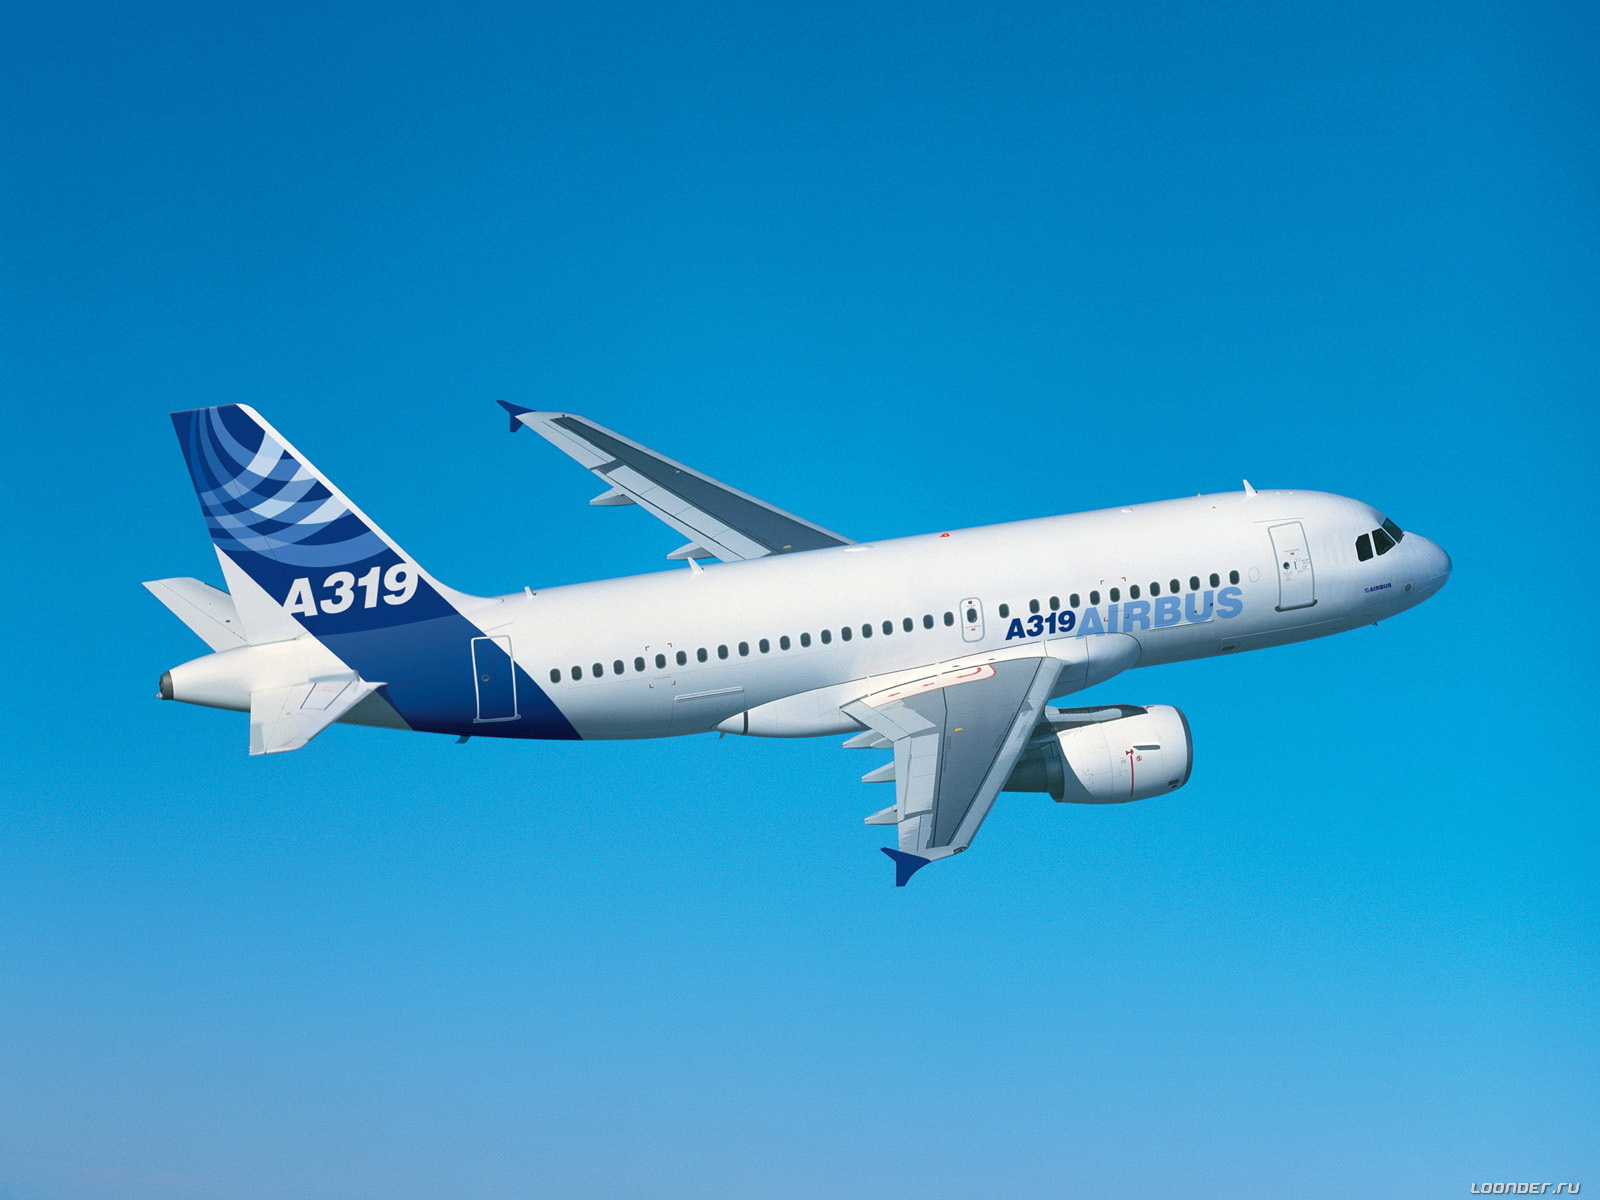 Airbus Corporate Jet (ACJ)